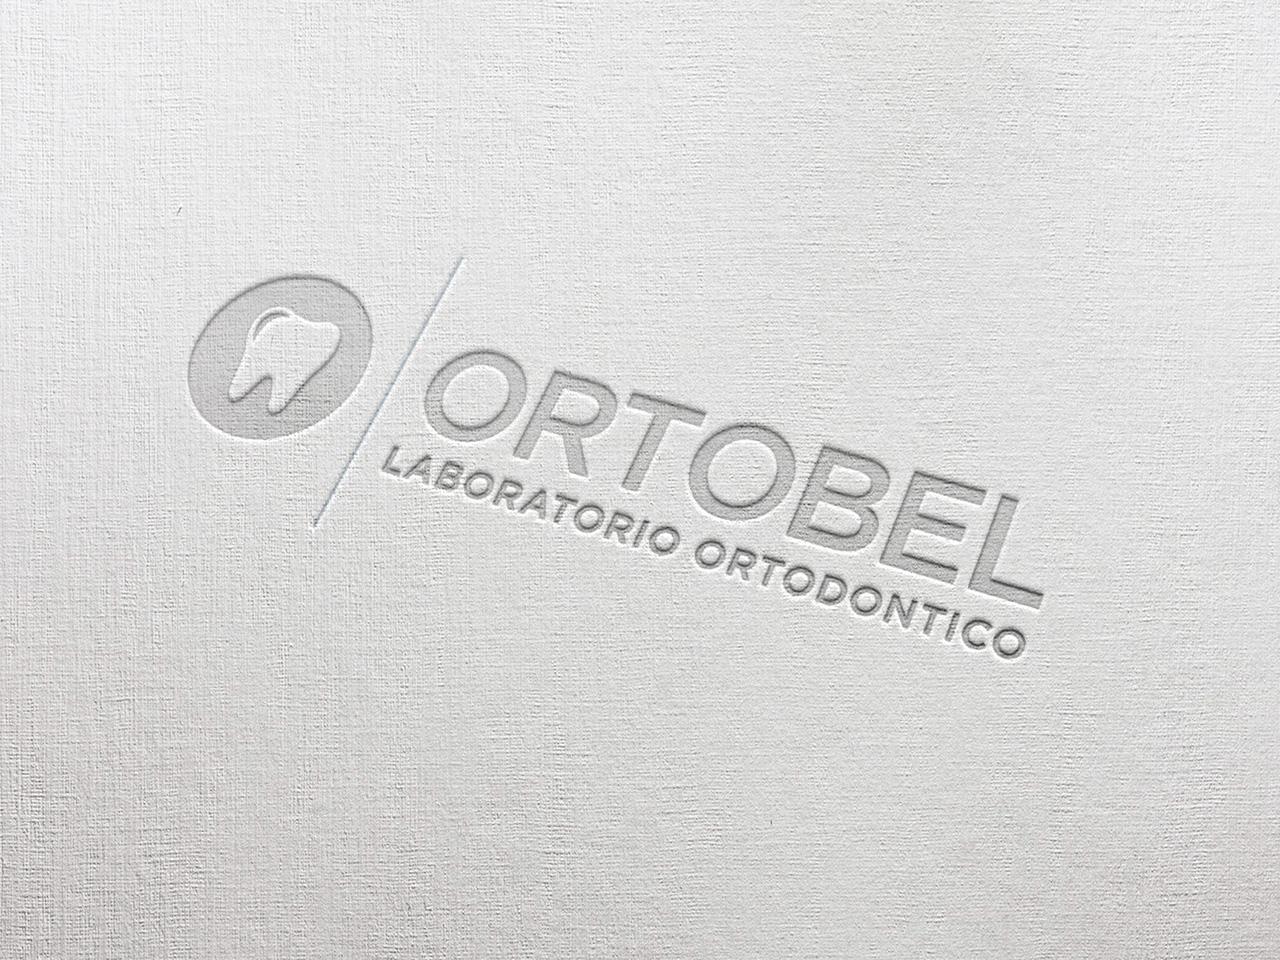 OTB_proposta_01_02